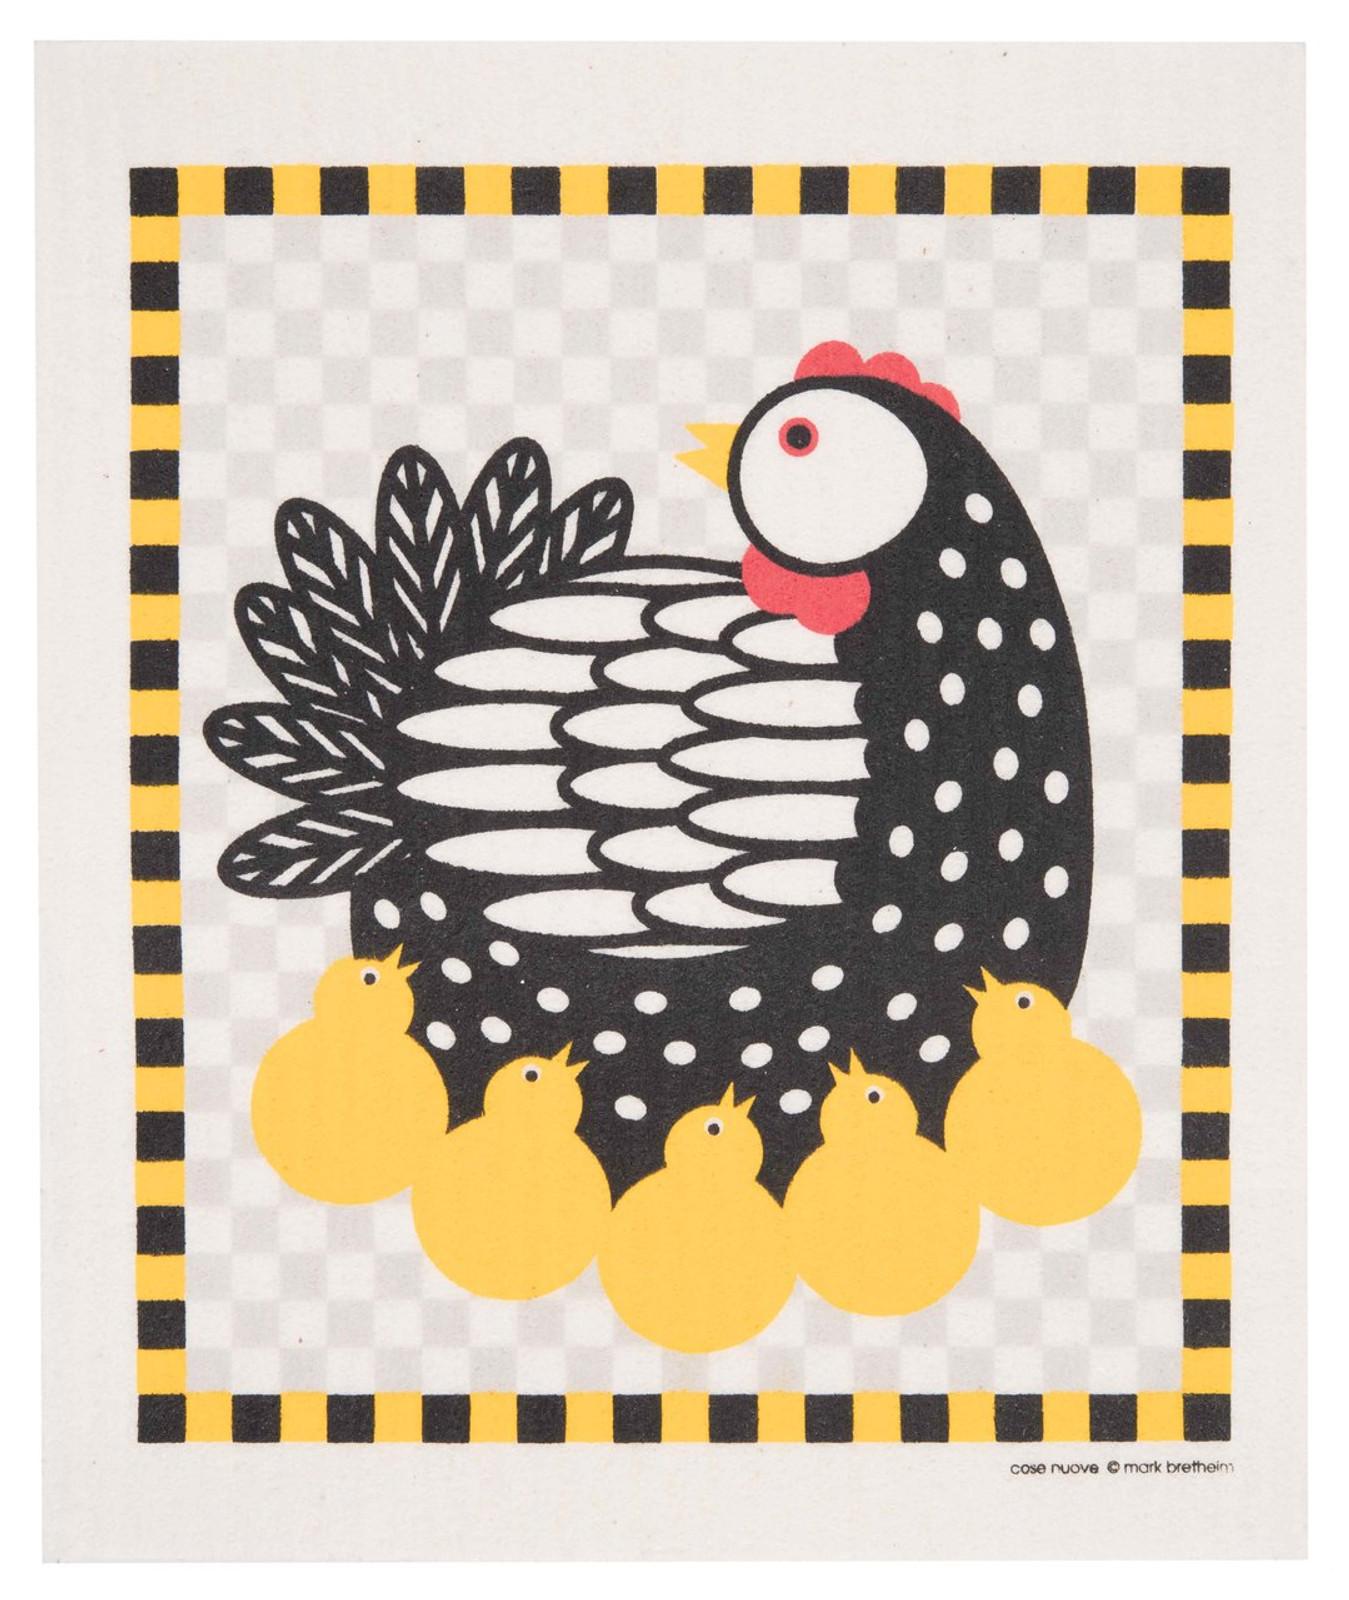 Swedish Dishcloth, Chickens design